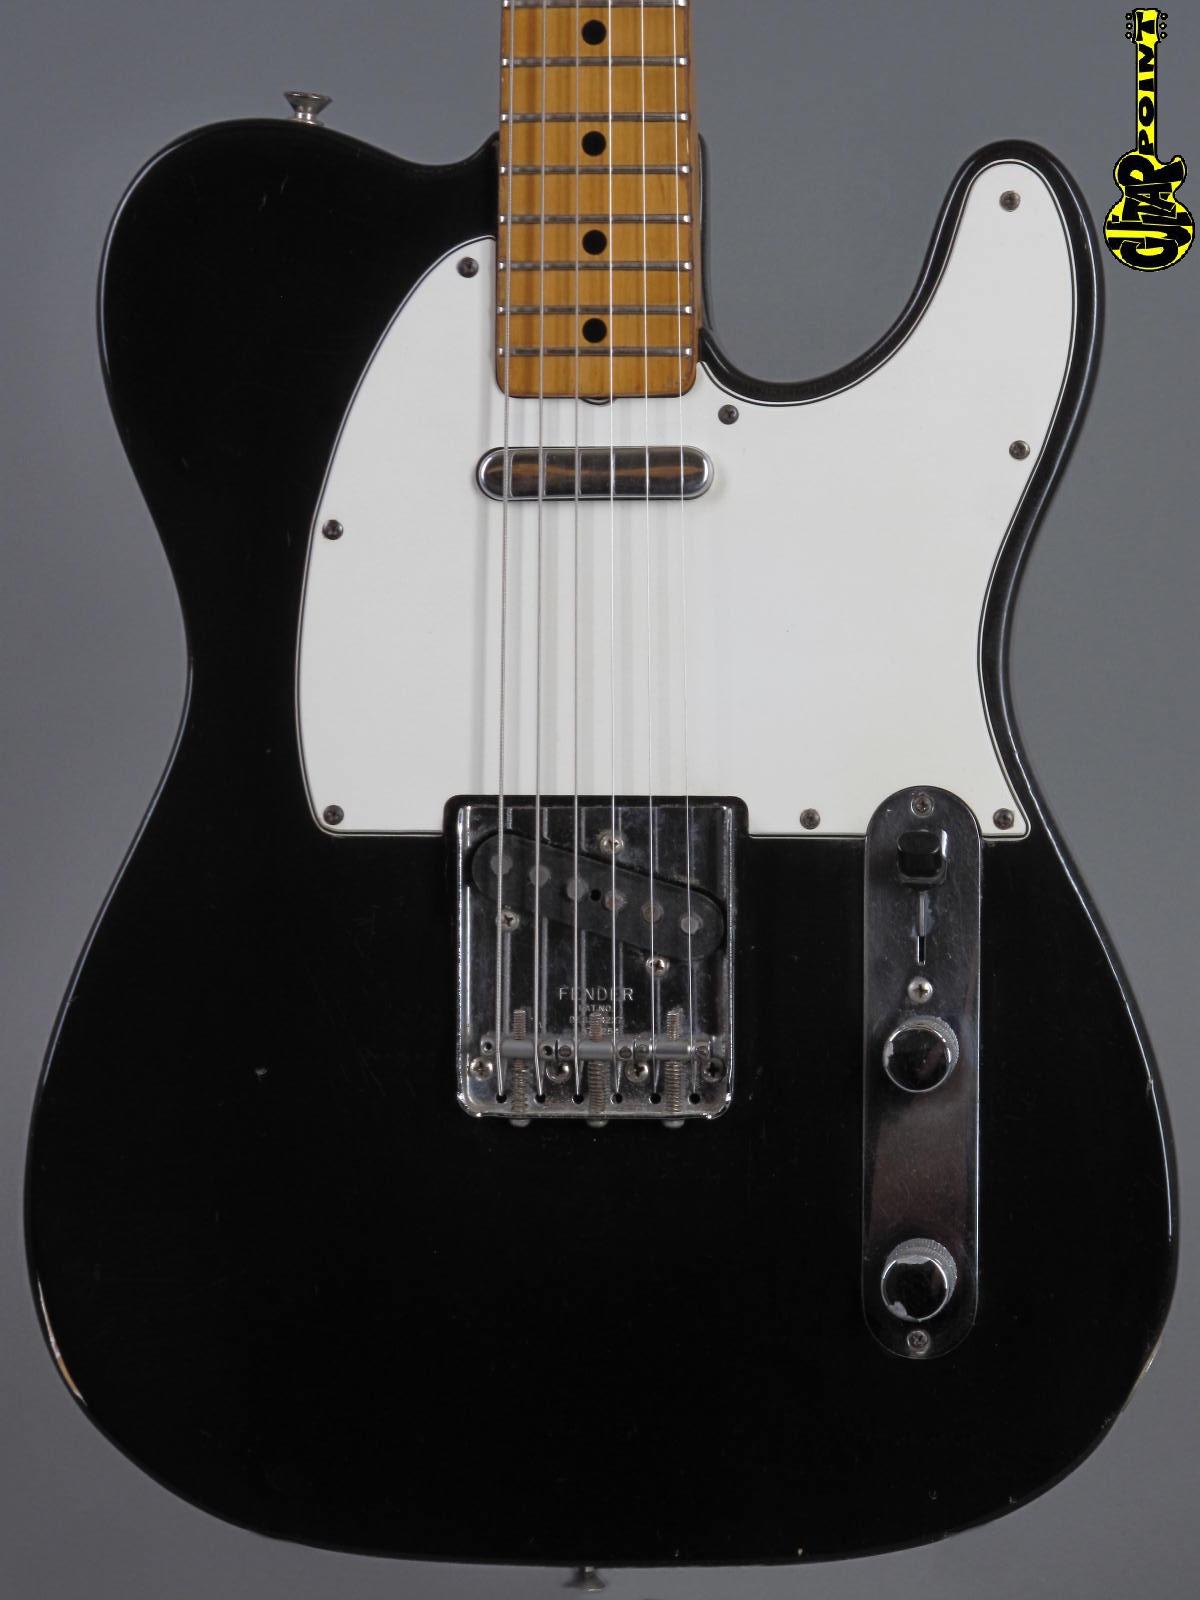 1974 Fender Telecaster - Black ...rare !!!